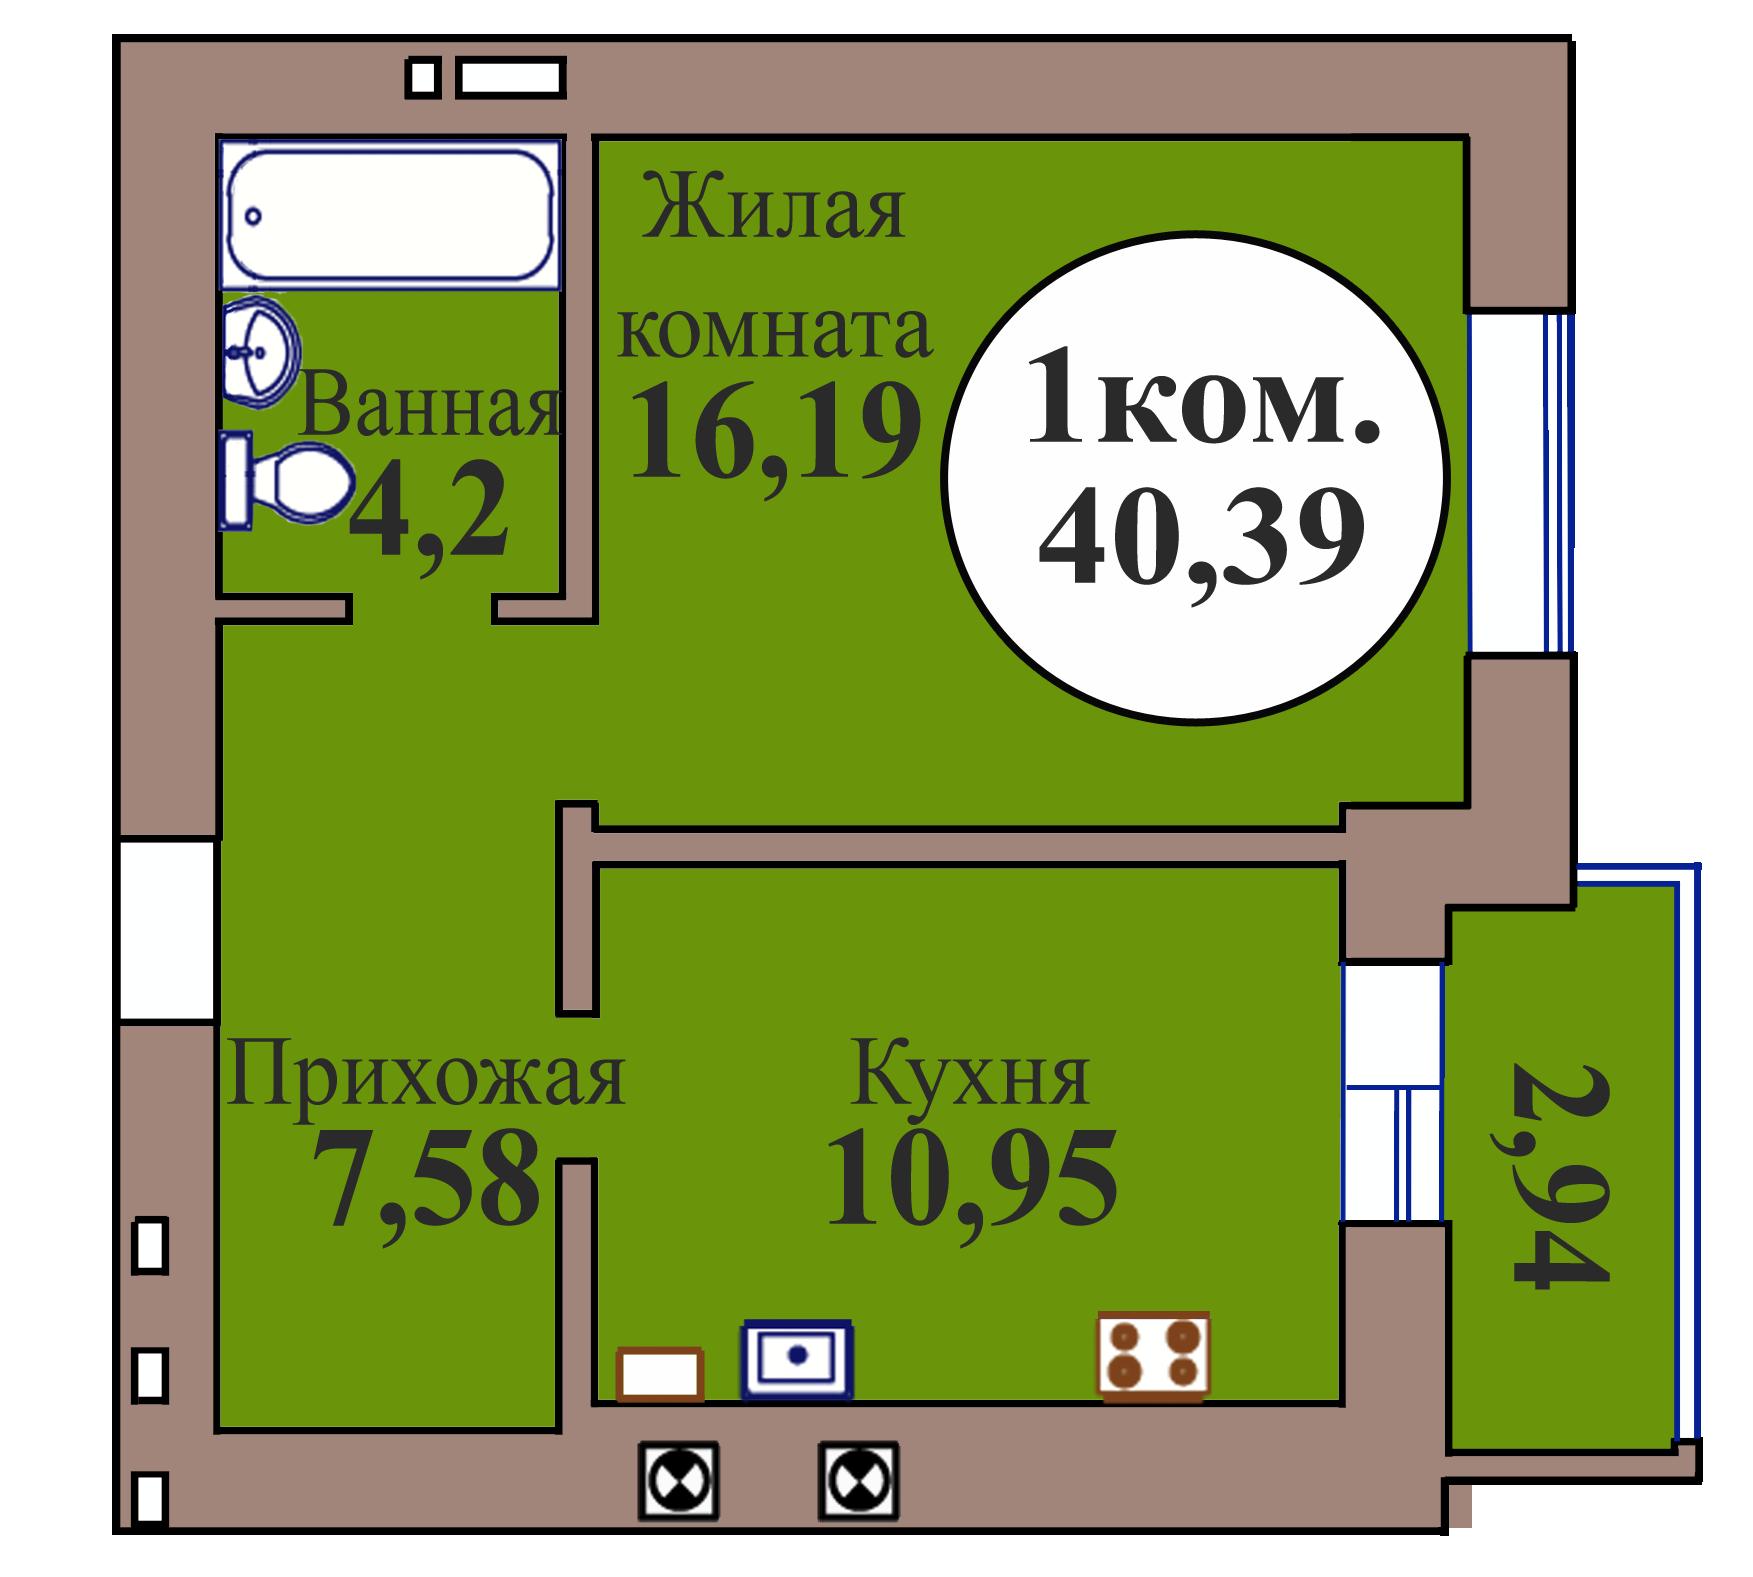 1-комн. кв. по пер. Калининградский, 5 кв. 123 в Калининграде